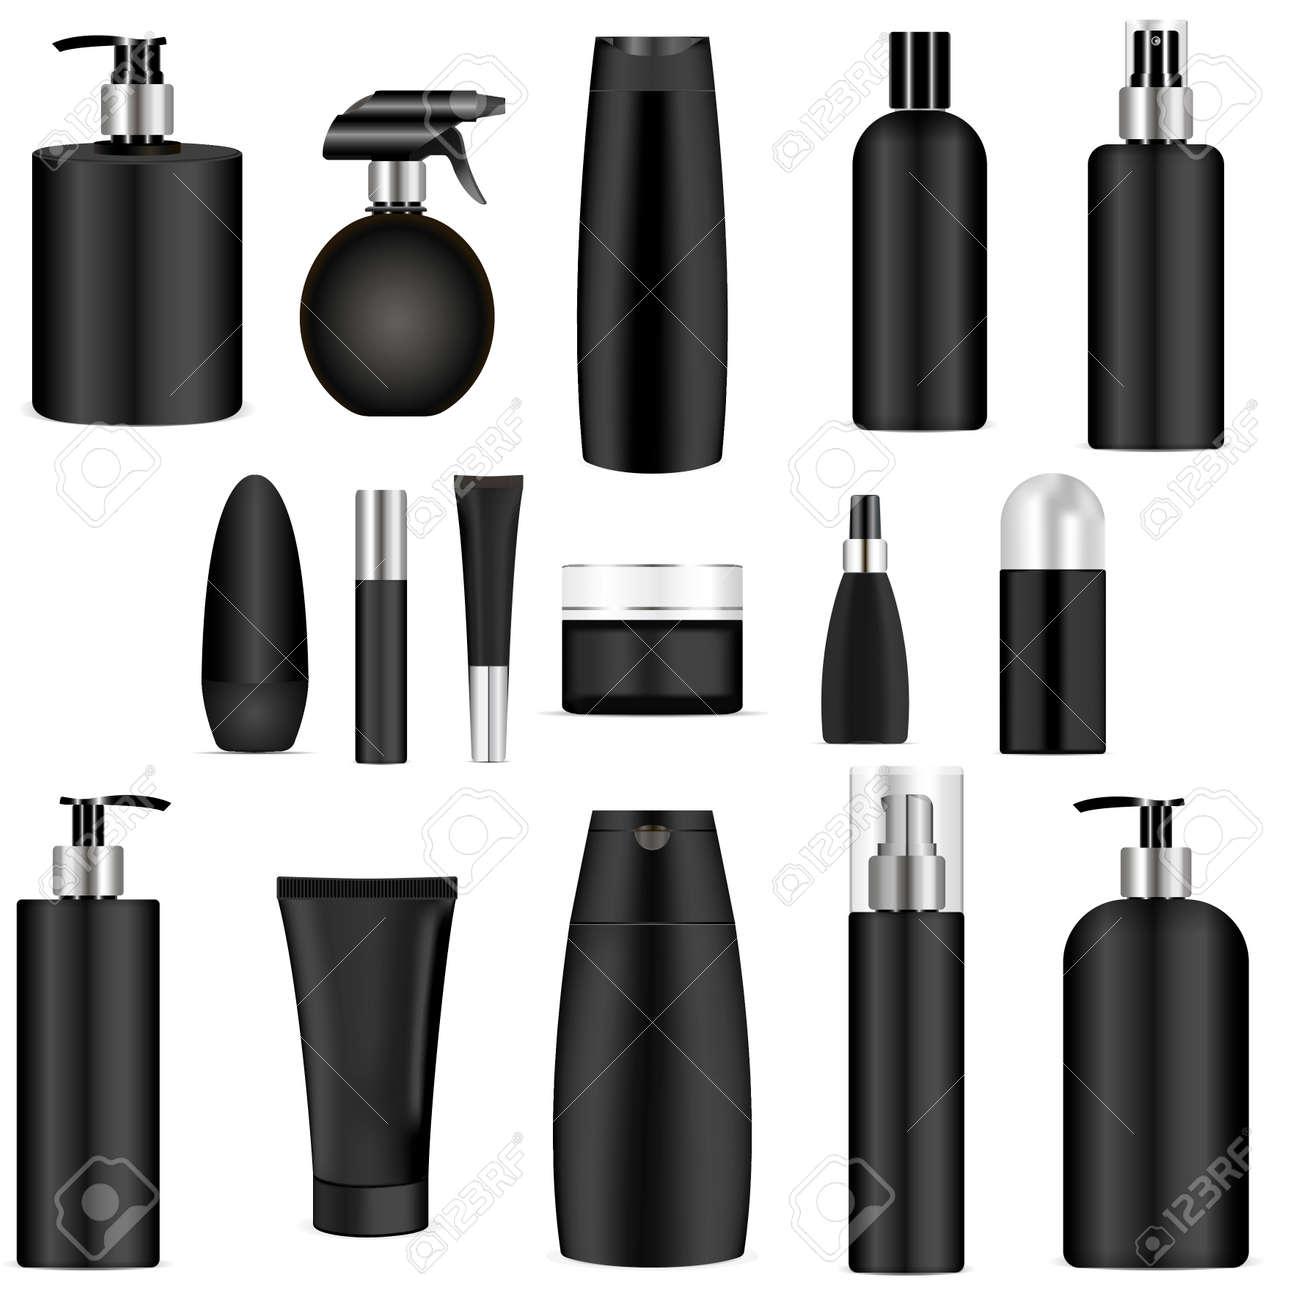 Black cosmetics bottle set. 3d mock-up package. Vector illustration of spray, dispenser and dropper, cream jar, shampoo, lotion, soap, toothpaste. - 120672949